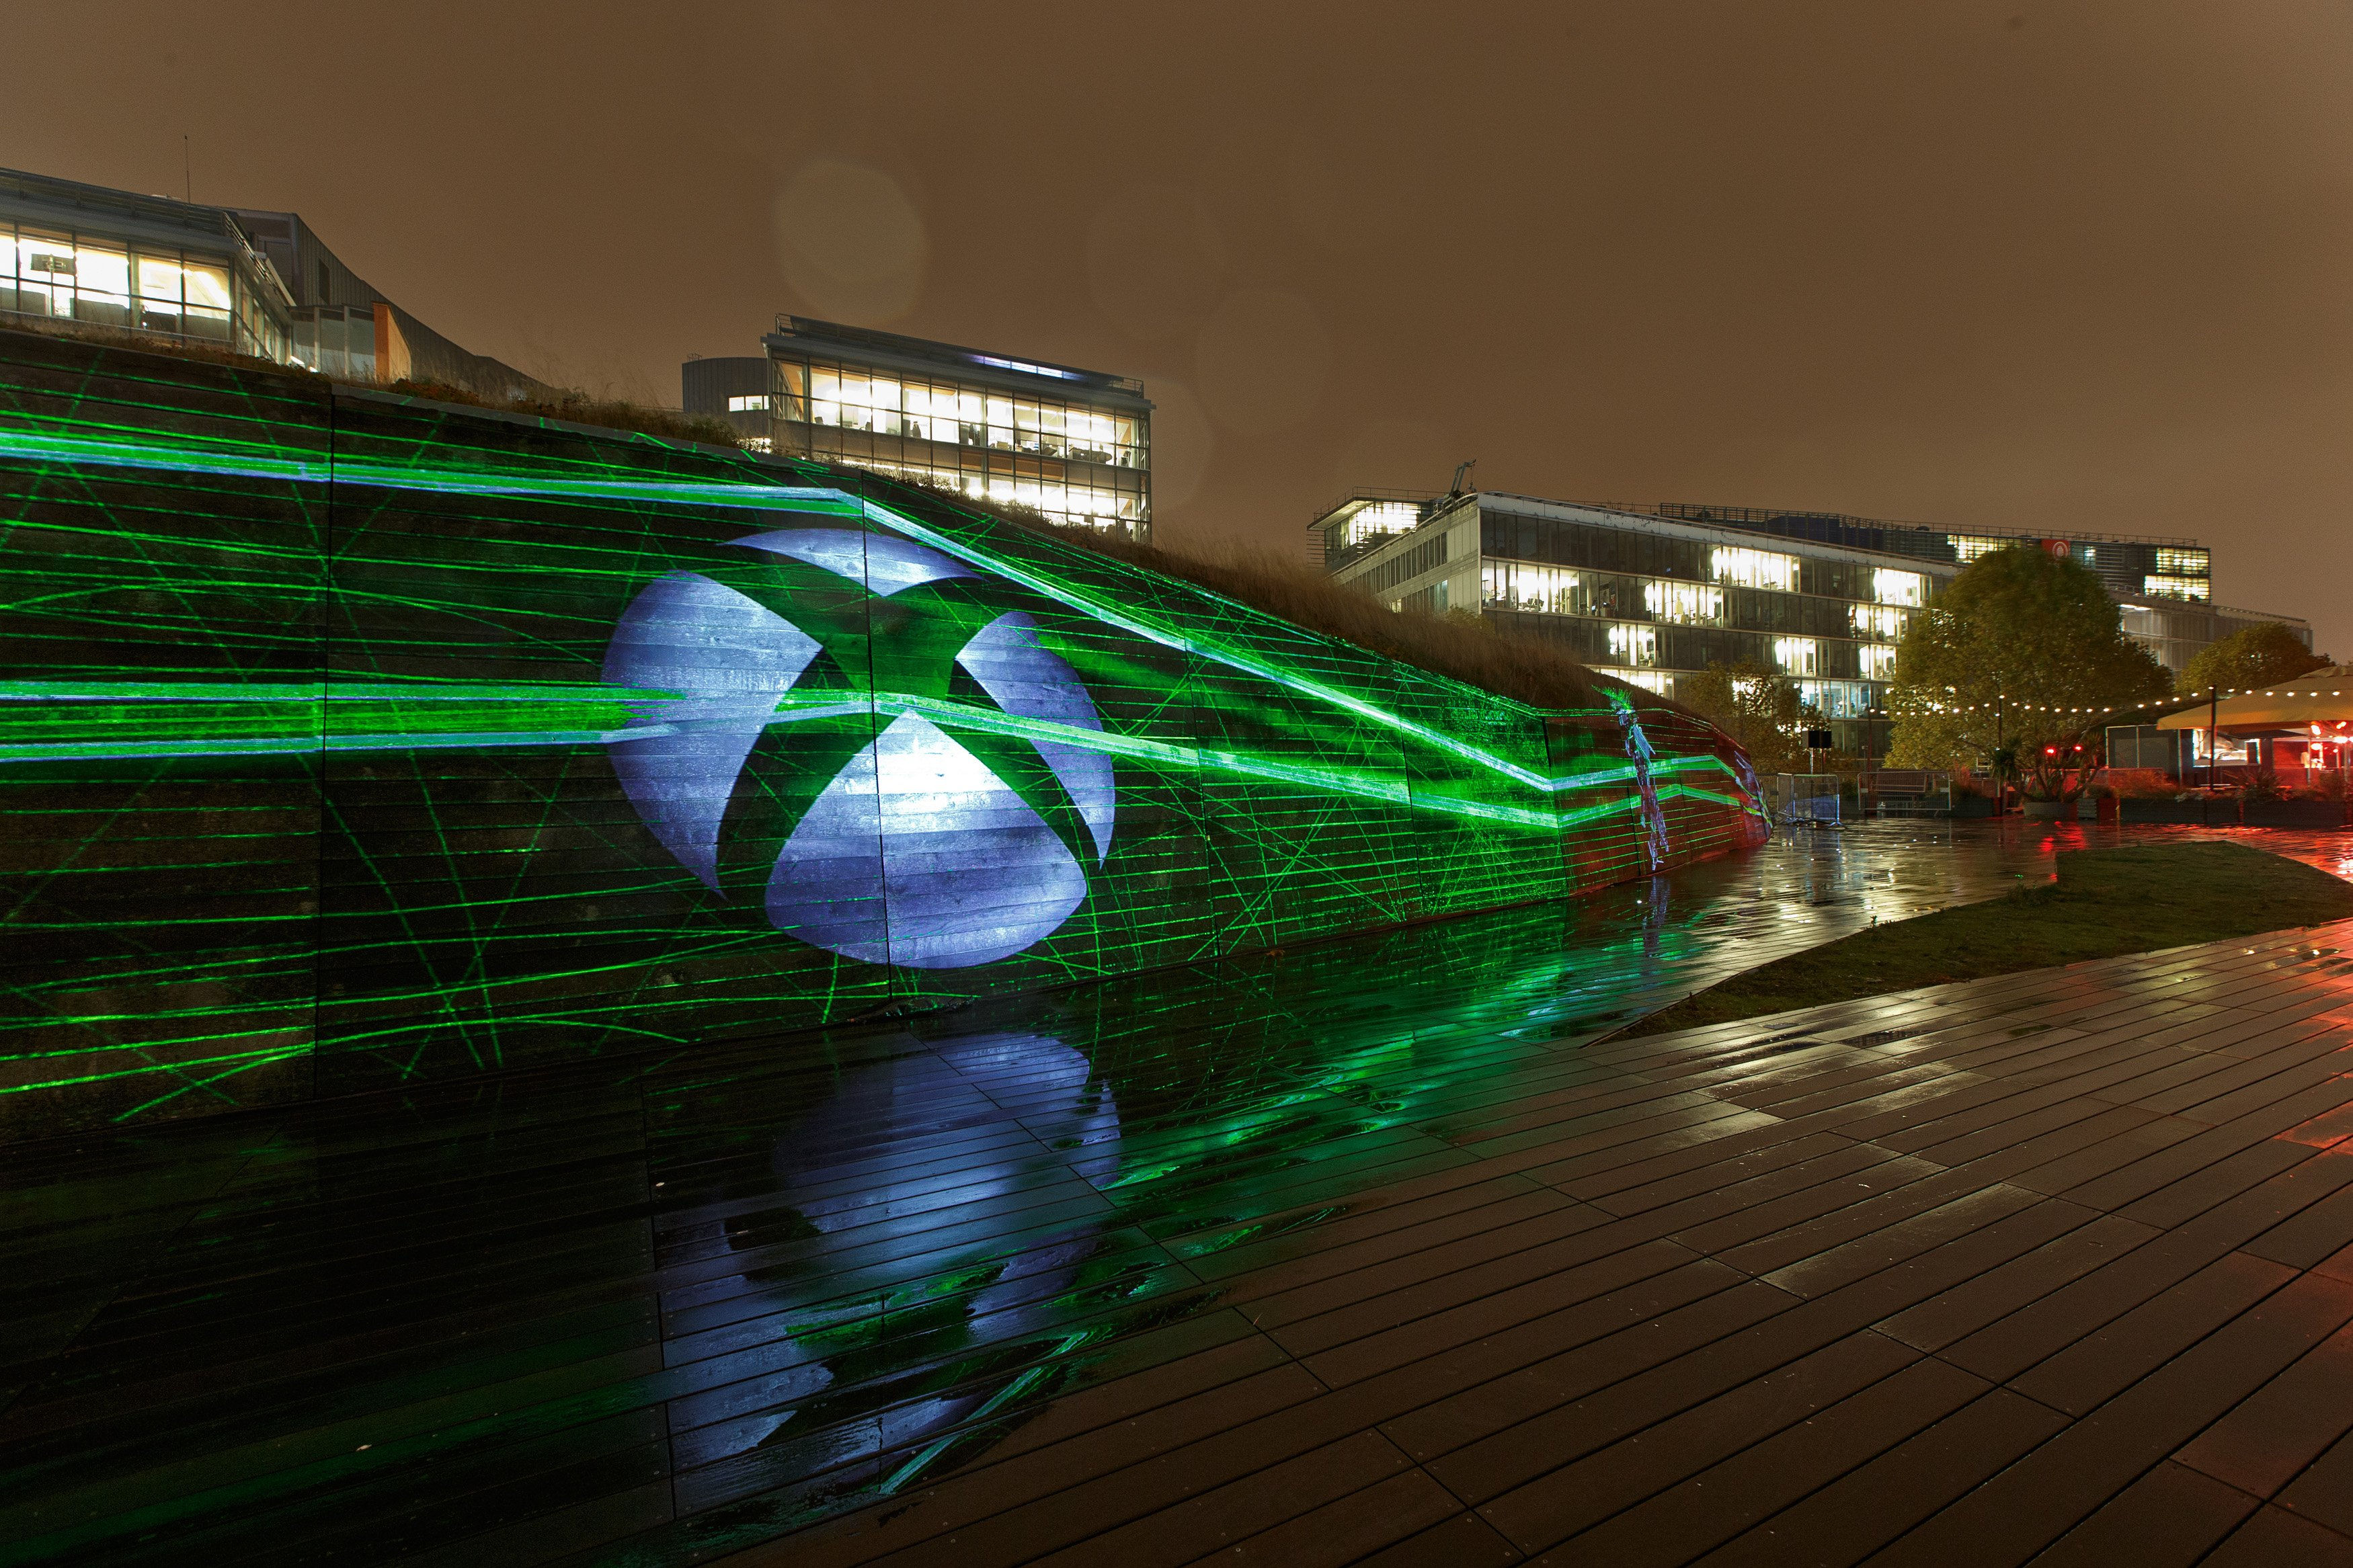 Download Wallpaper Logo Xbox One - 9ejmkr  Trends_789146.jpg